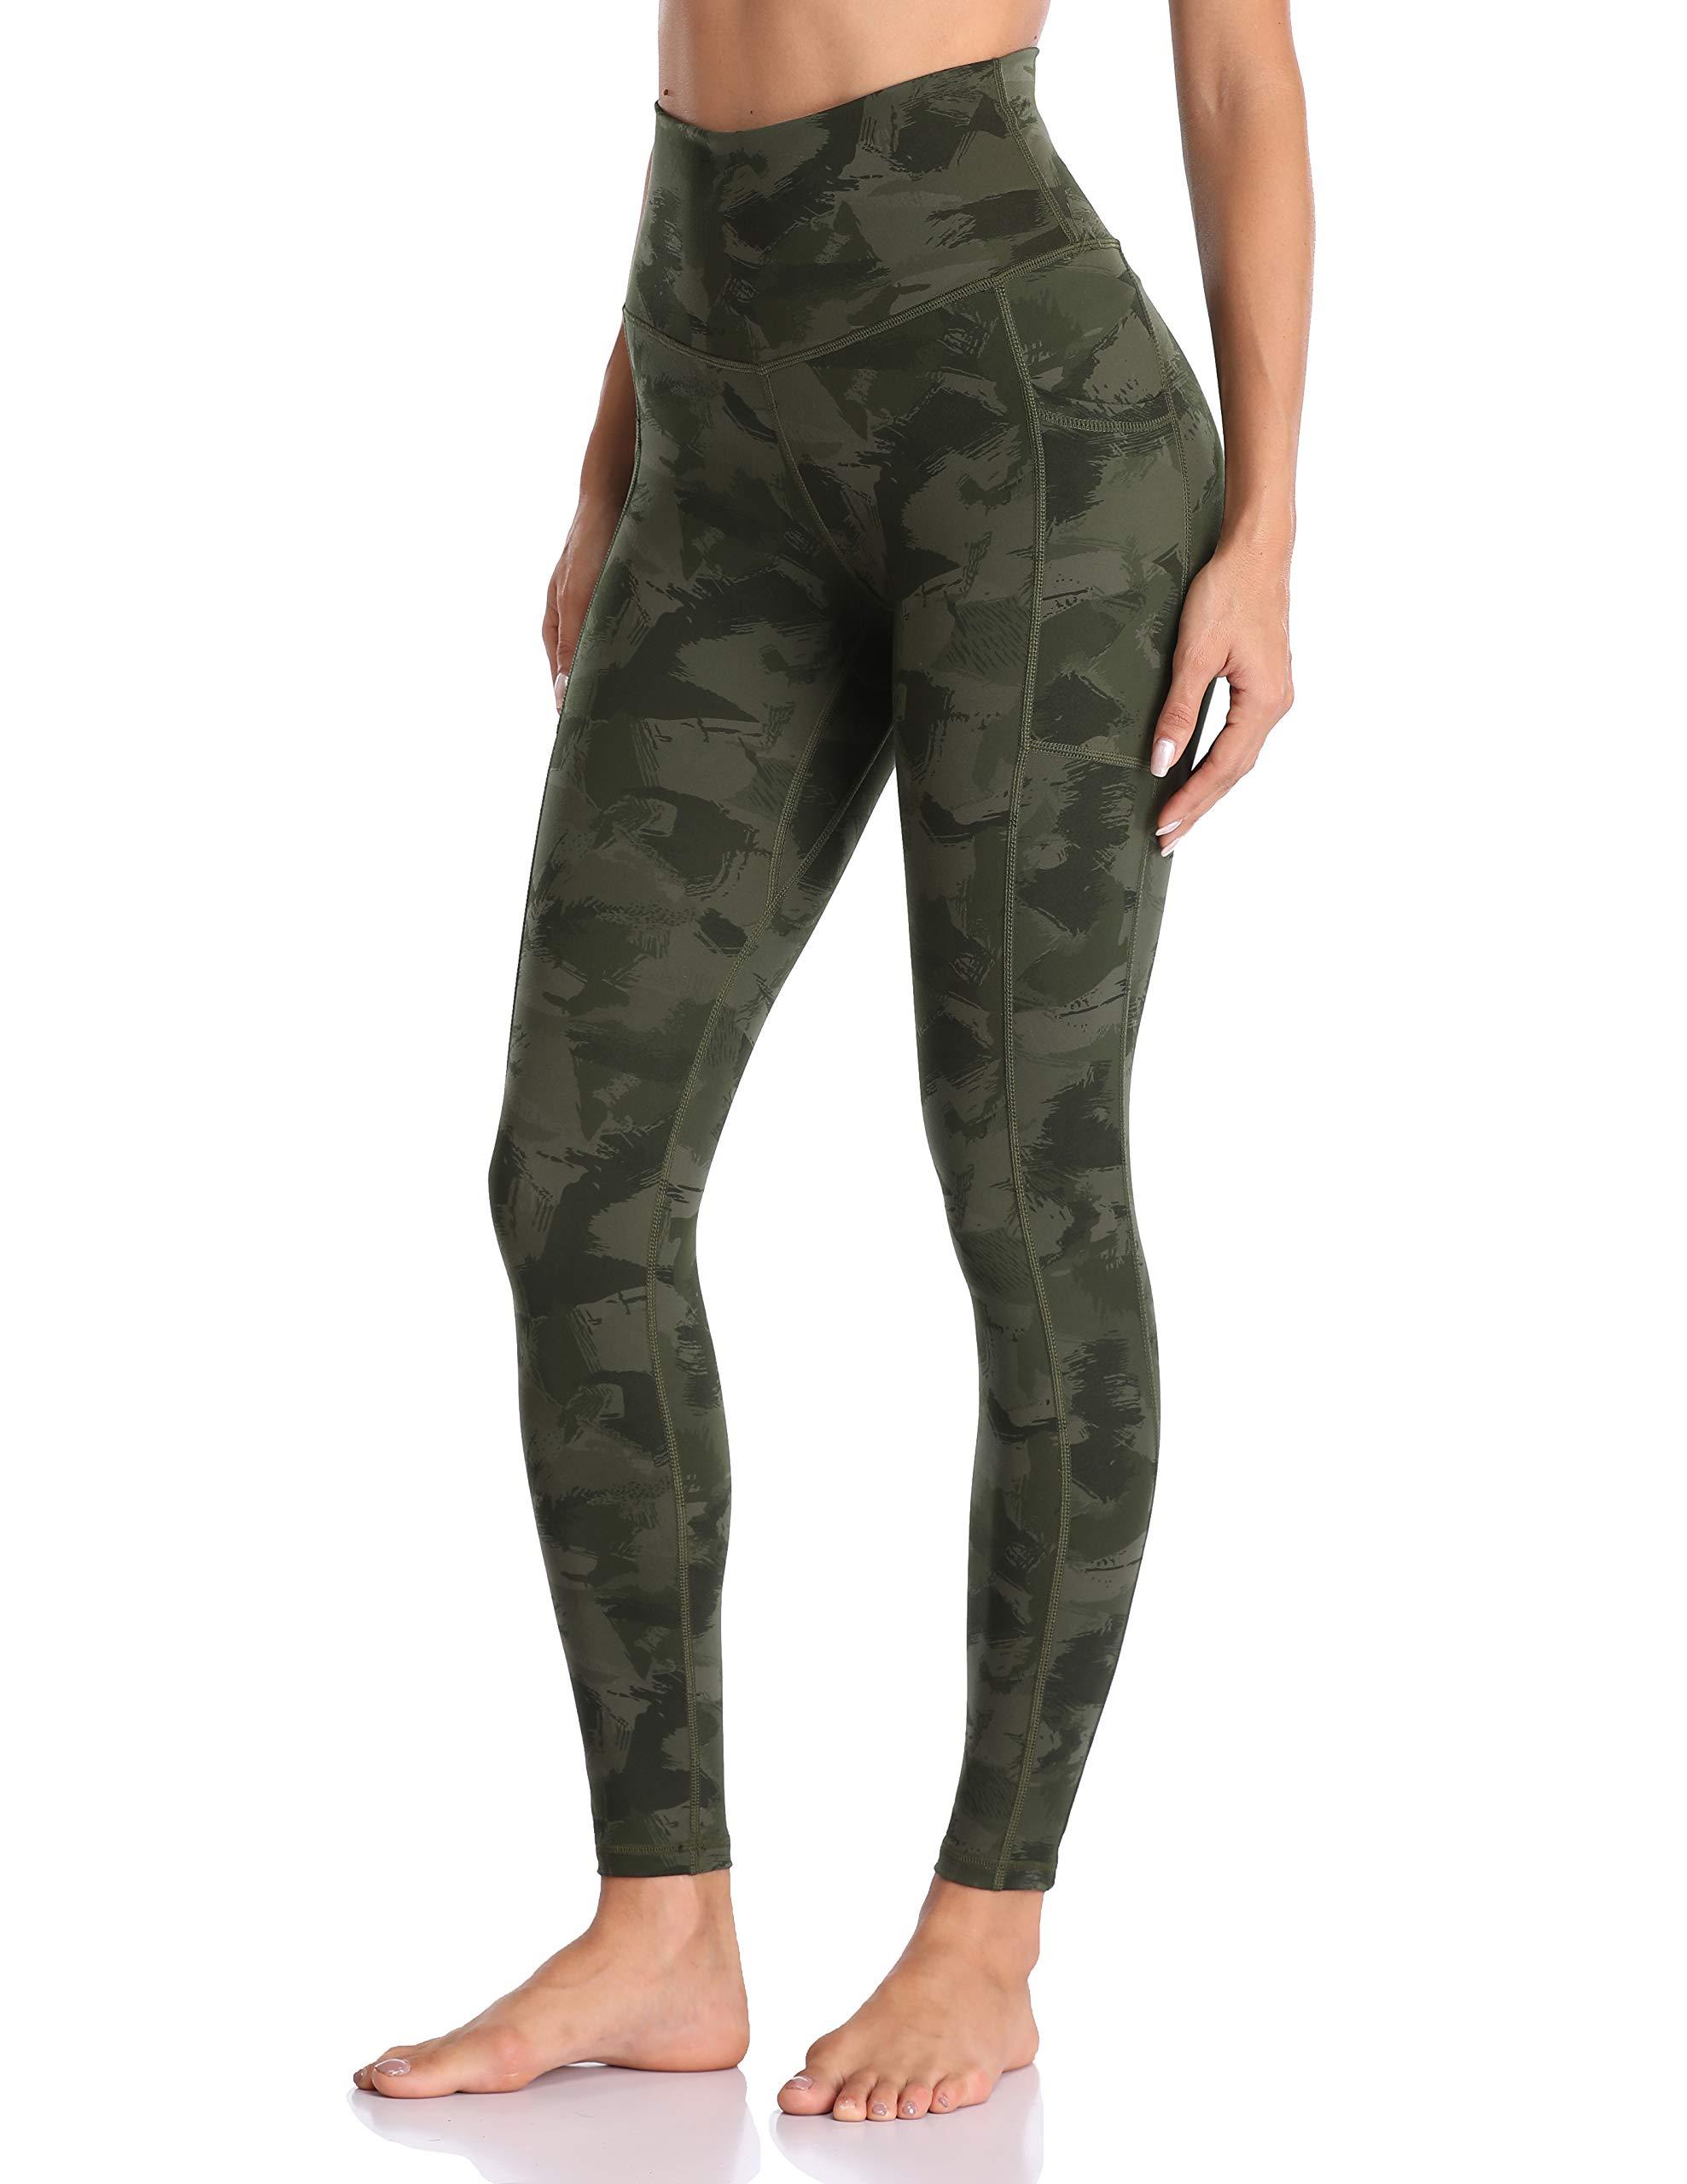 Colorfulkoala Women's High Waisted Yoga Pants 7/8 Length Leggings with Pockets (XS, Army Green Splinter Camo) by Colorfulkoala